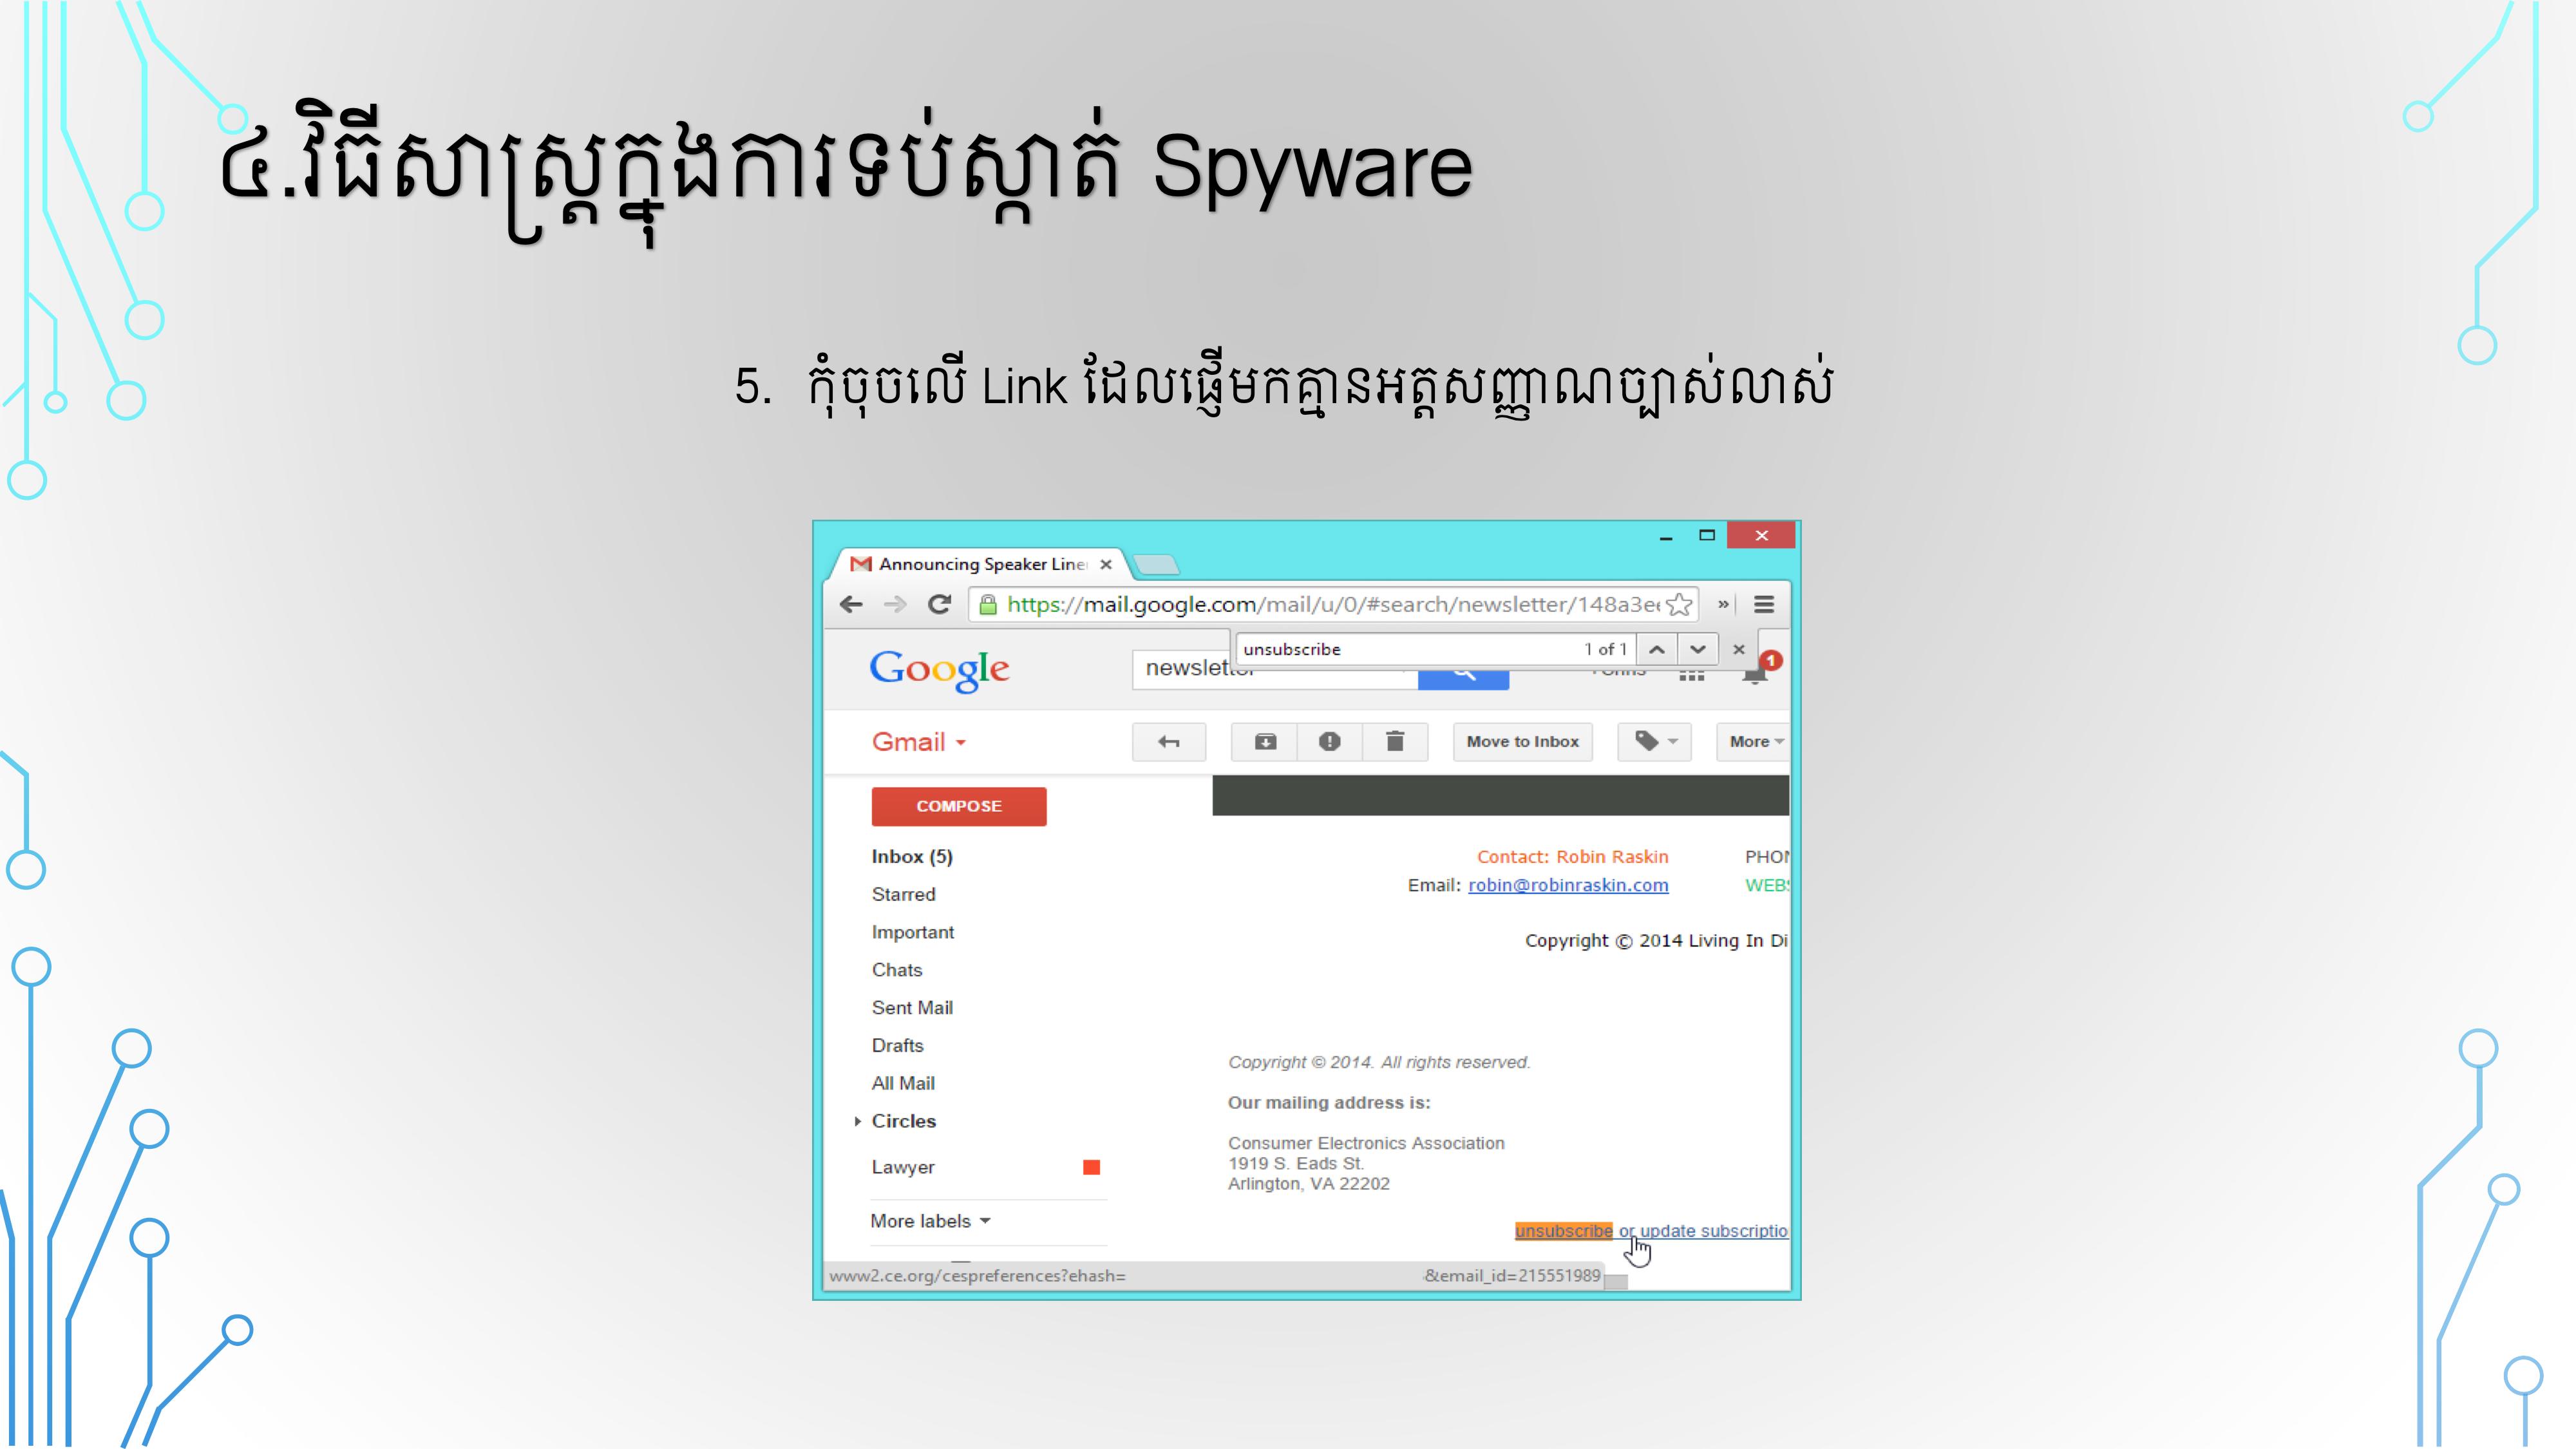 NIPTICT-Spyware-11